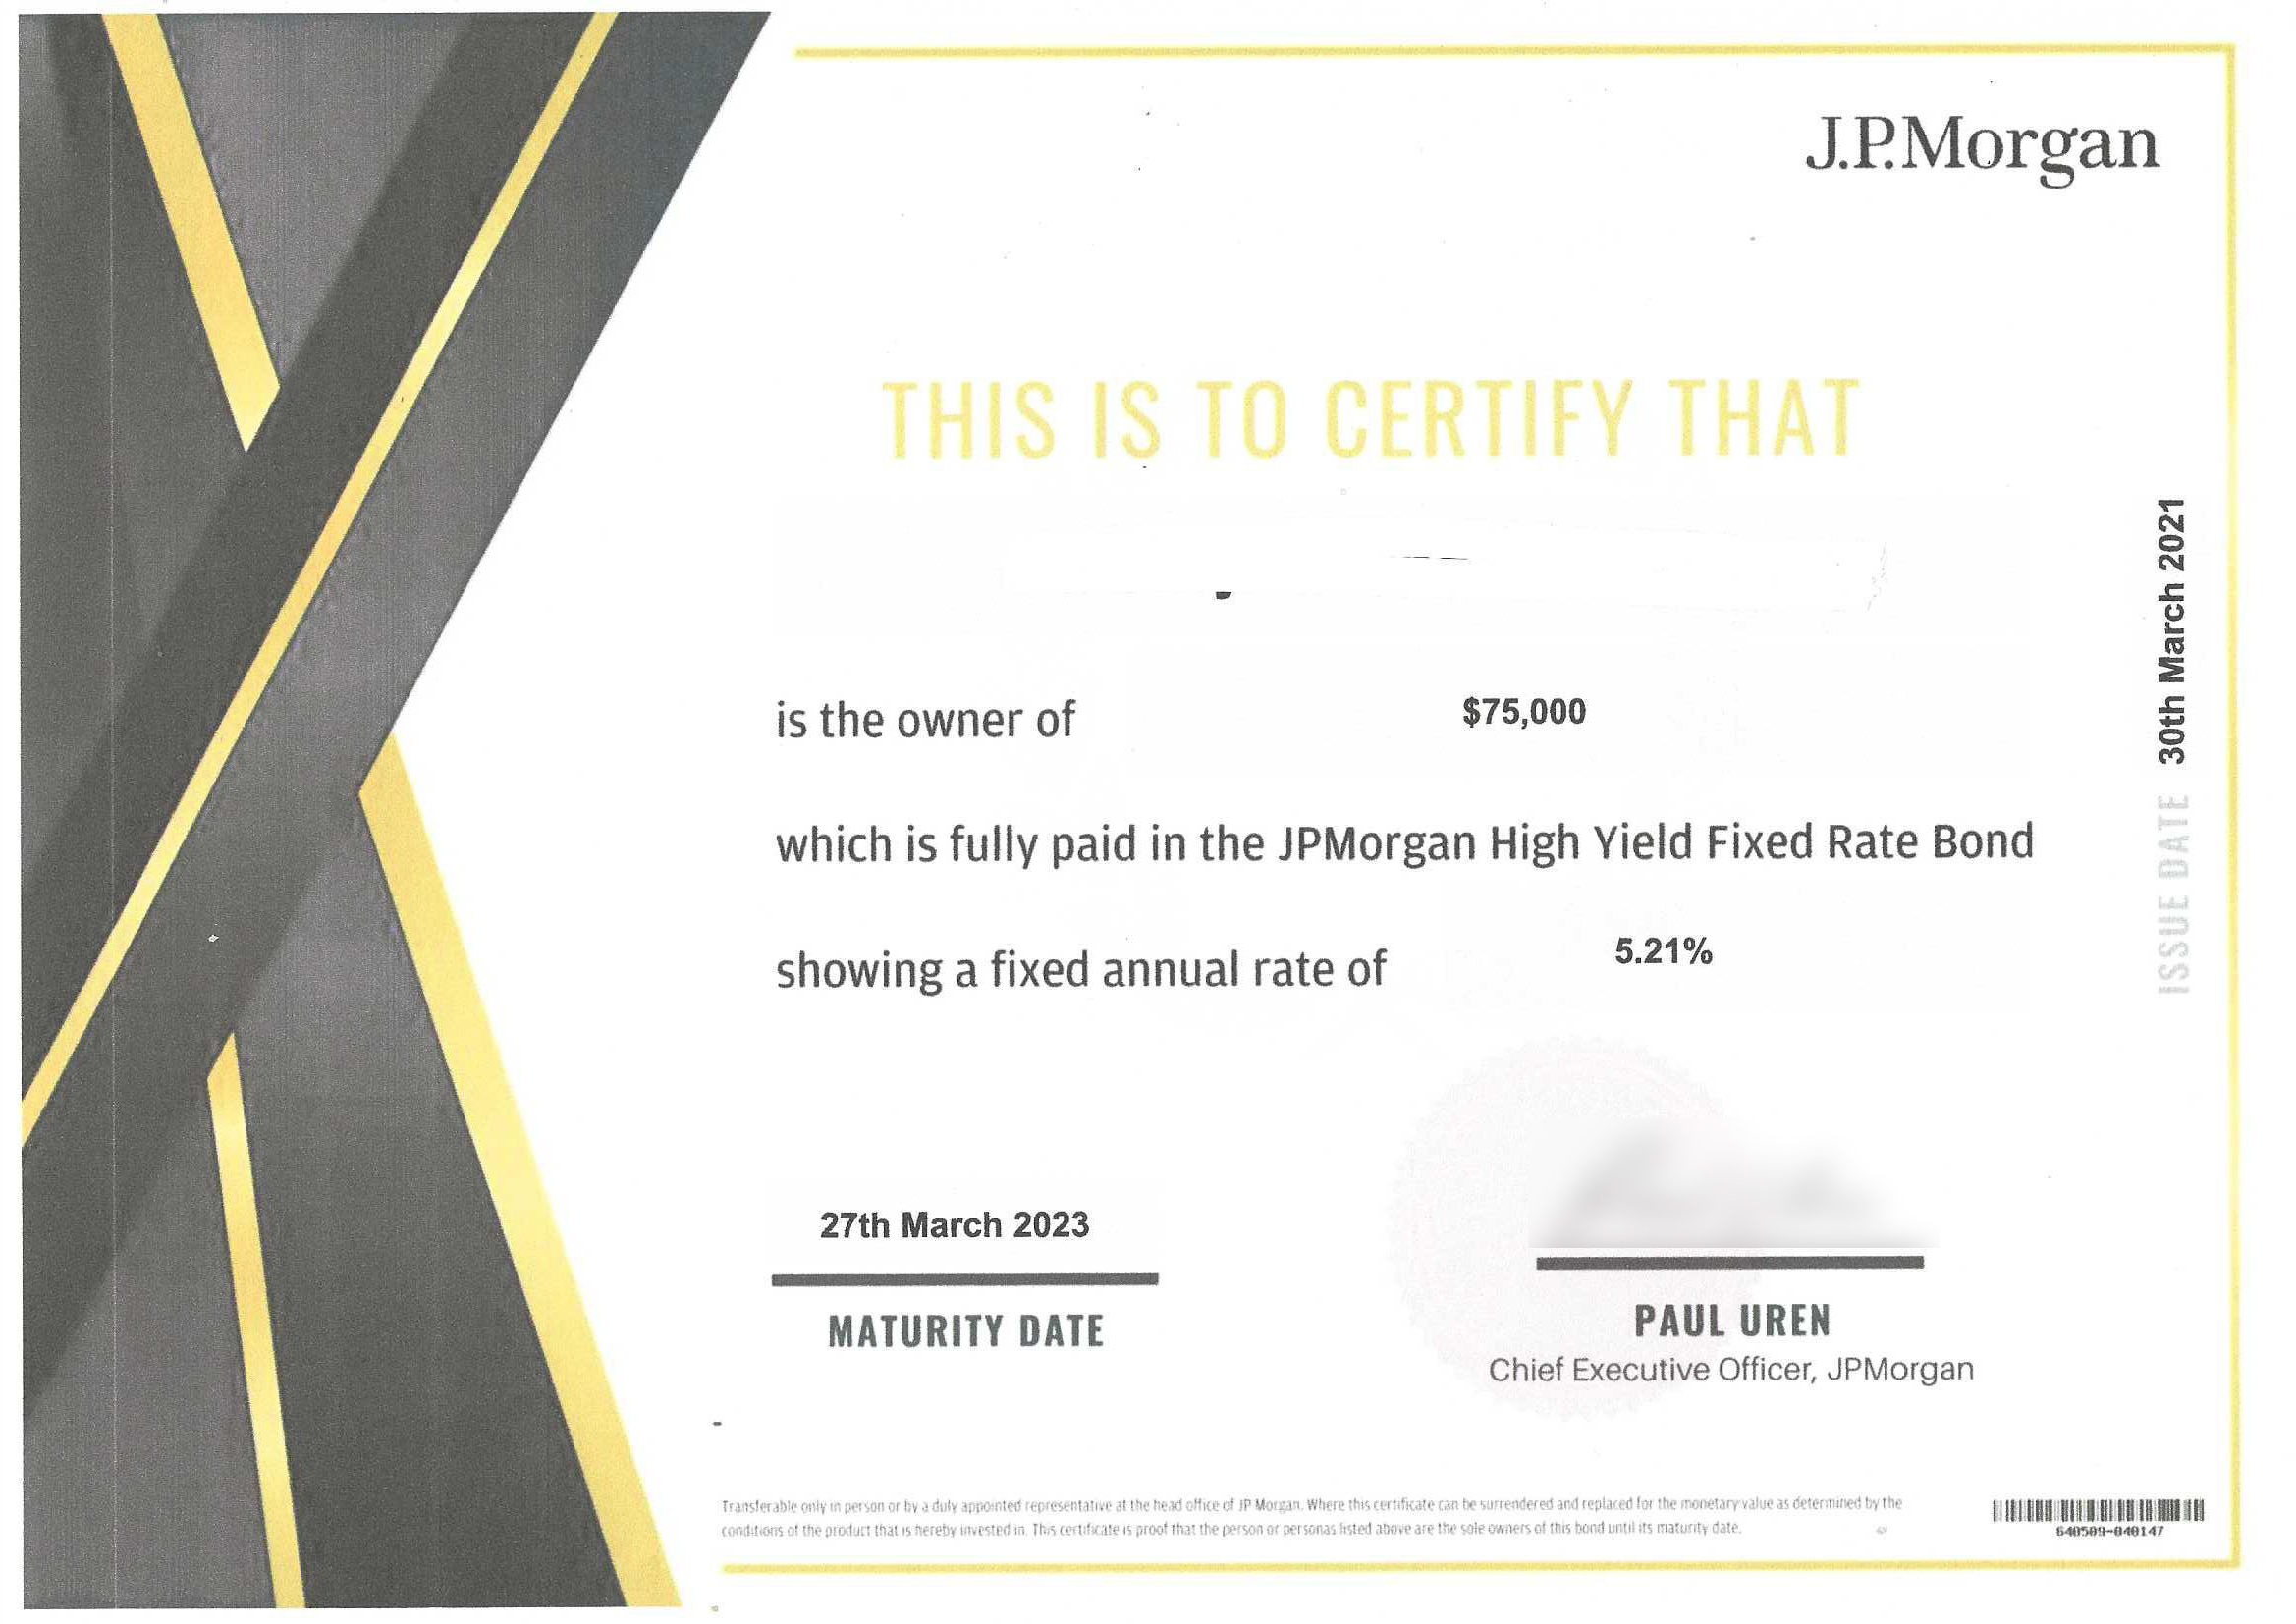 Picture of JP Morgan Bonds prospectus sent to Tony.